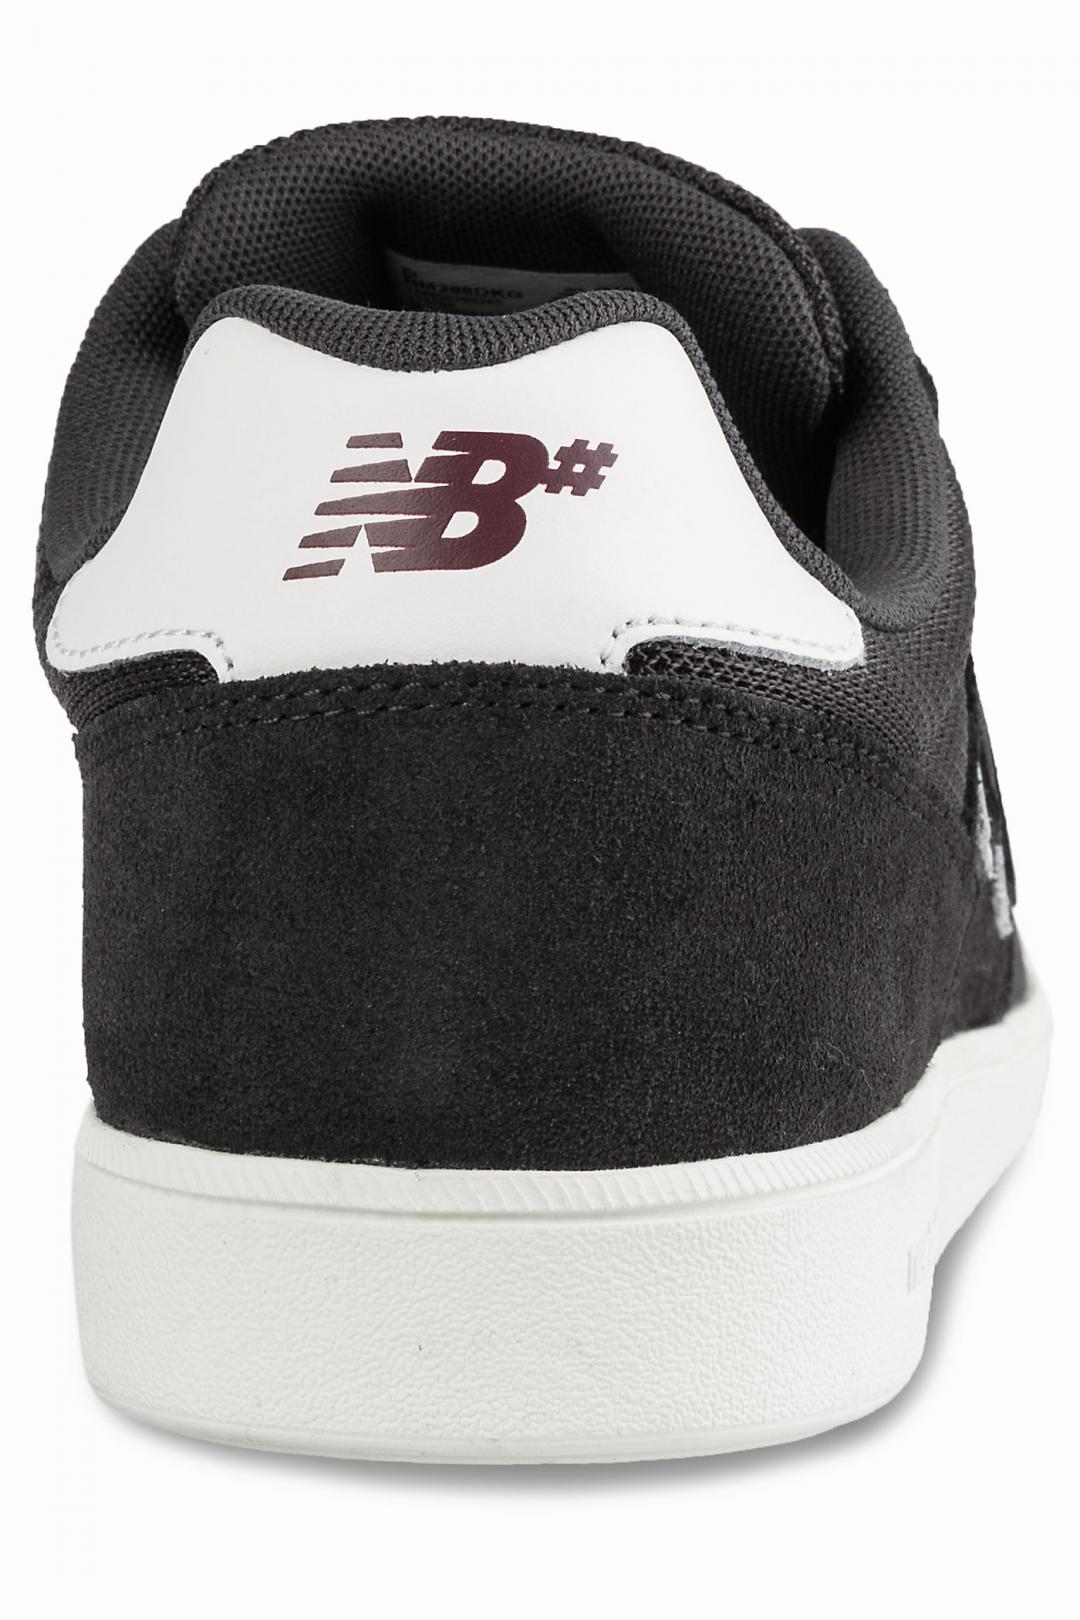 Uomo New Balance Numeric 288 black white | Sneaker